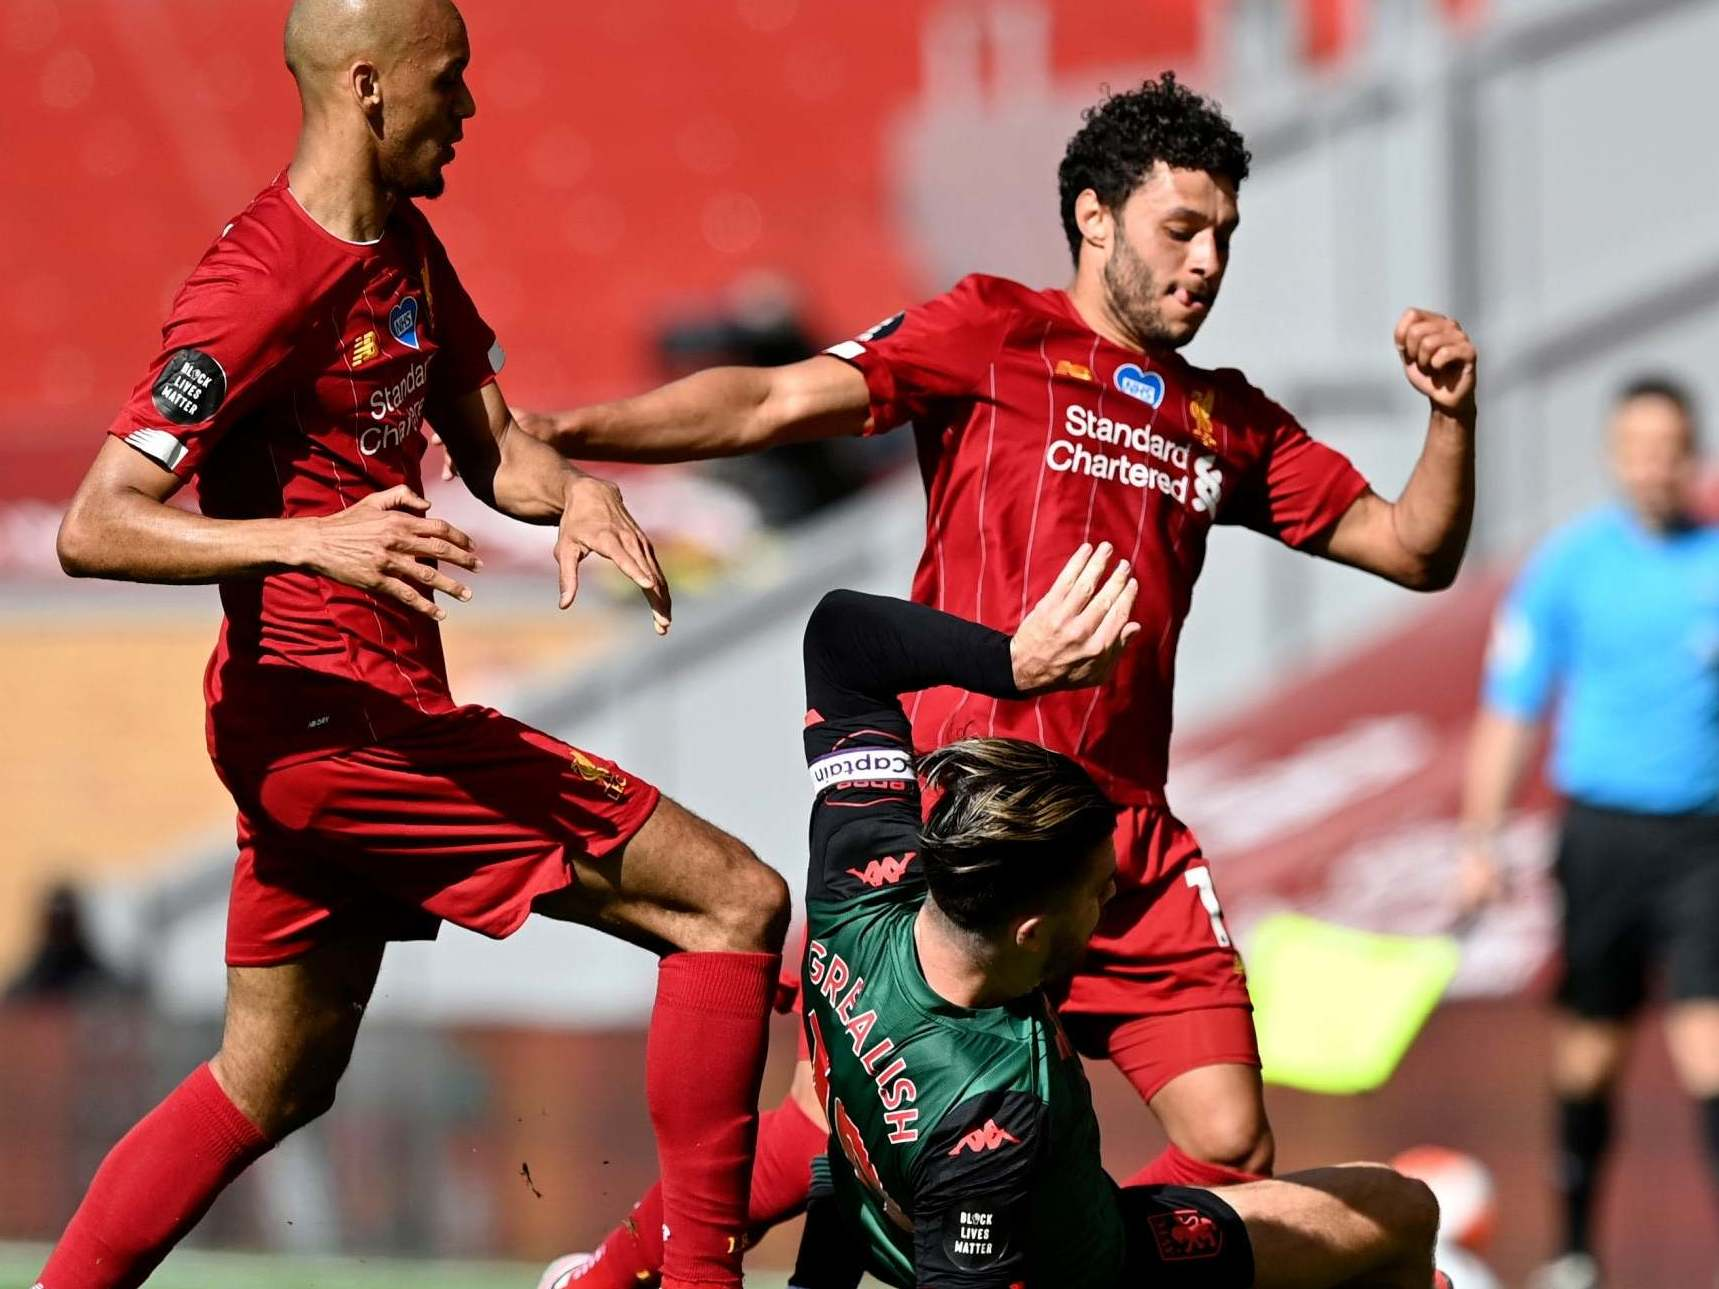 Liverpool Vs Aston Villa Free Live Stream 7 5 20 Watch Premier League Online Time Usa Tv Channel Angle News